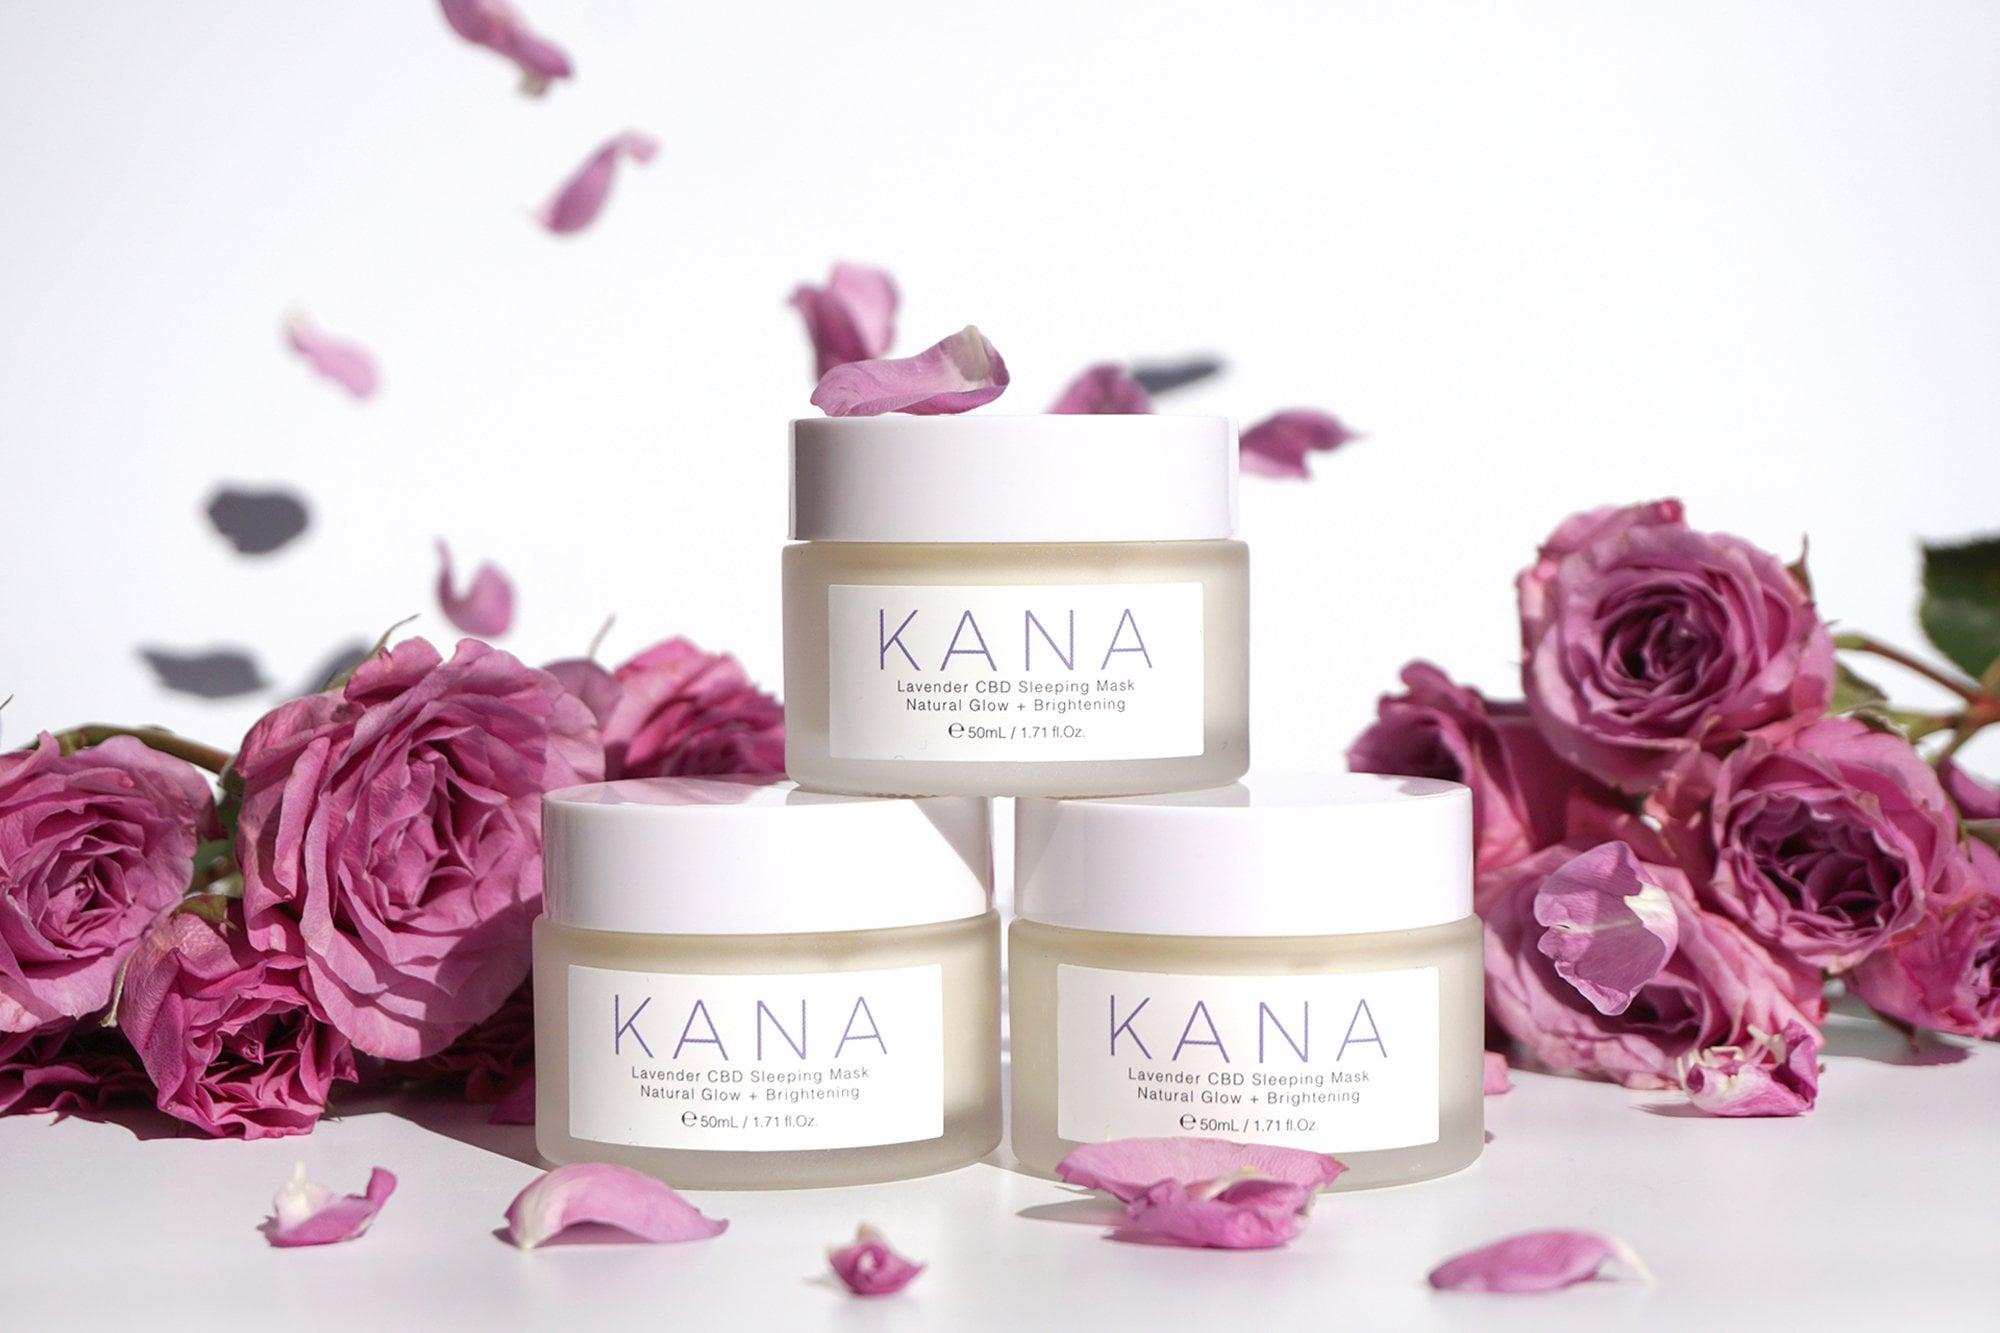 Kana Sleeping Mask With CBD Oil   POPSUGAR Beauty